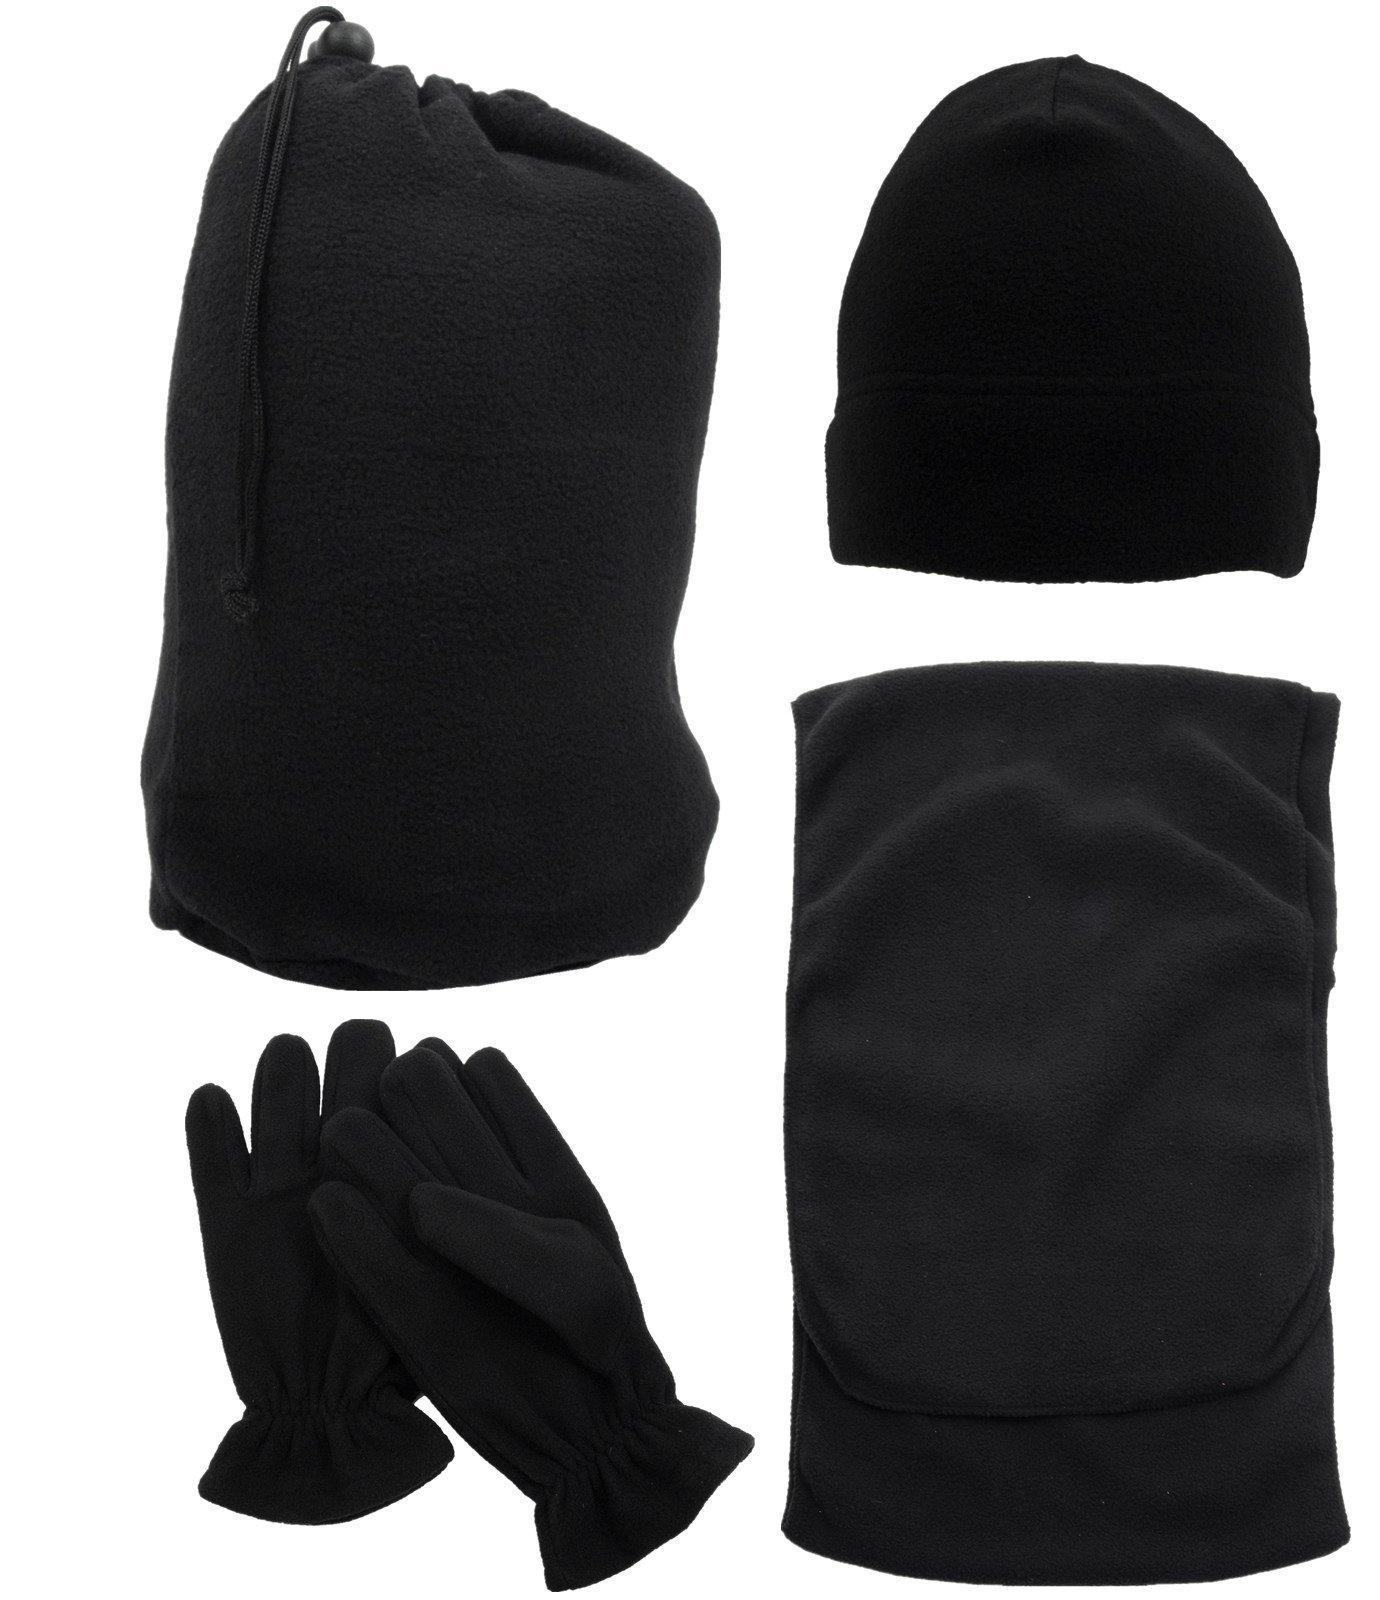 3 in 1 Men & Women's Soft Warm Knitted Hat Scarf & Gloves Winter Set , Black